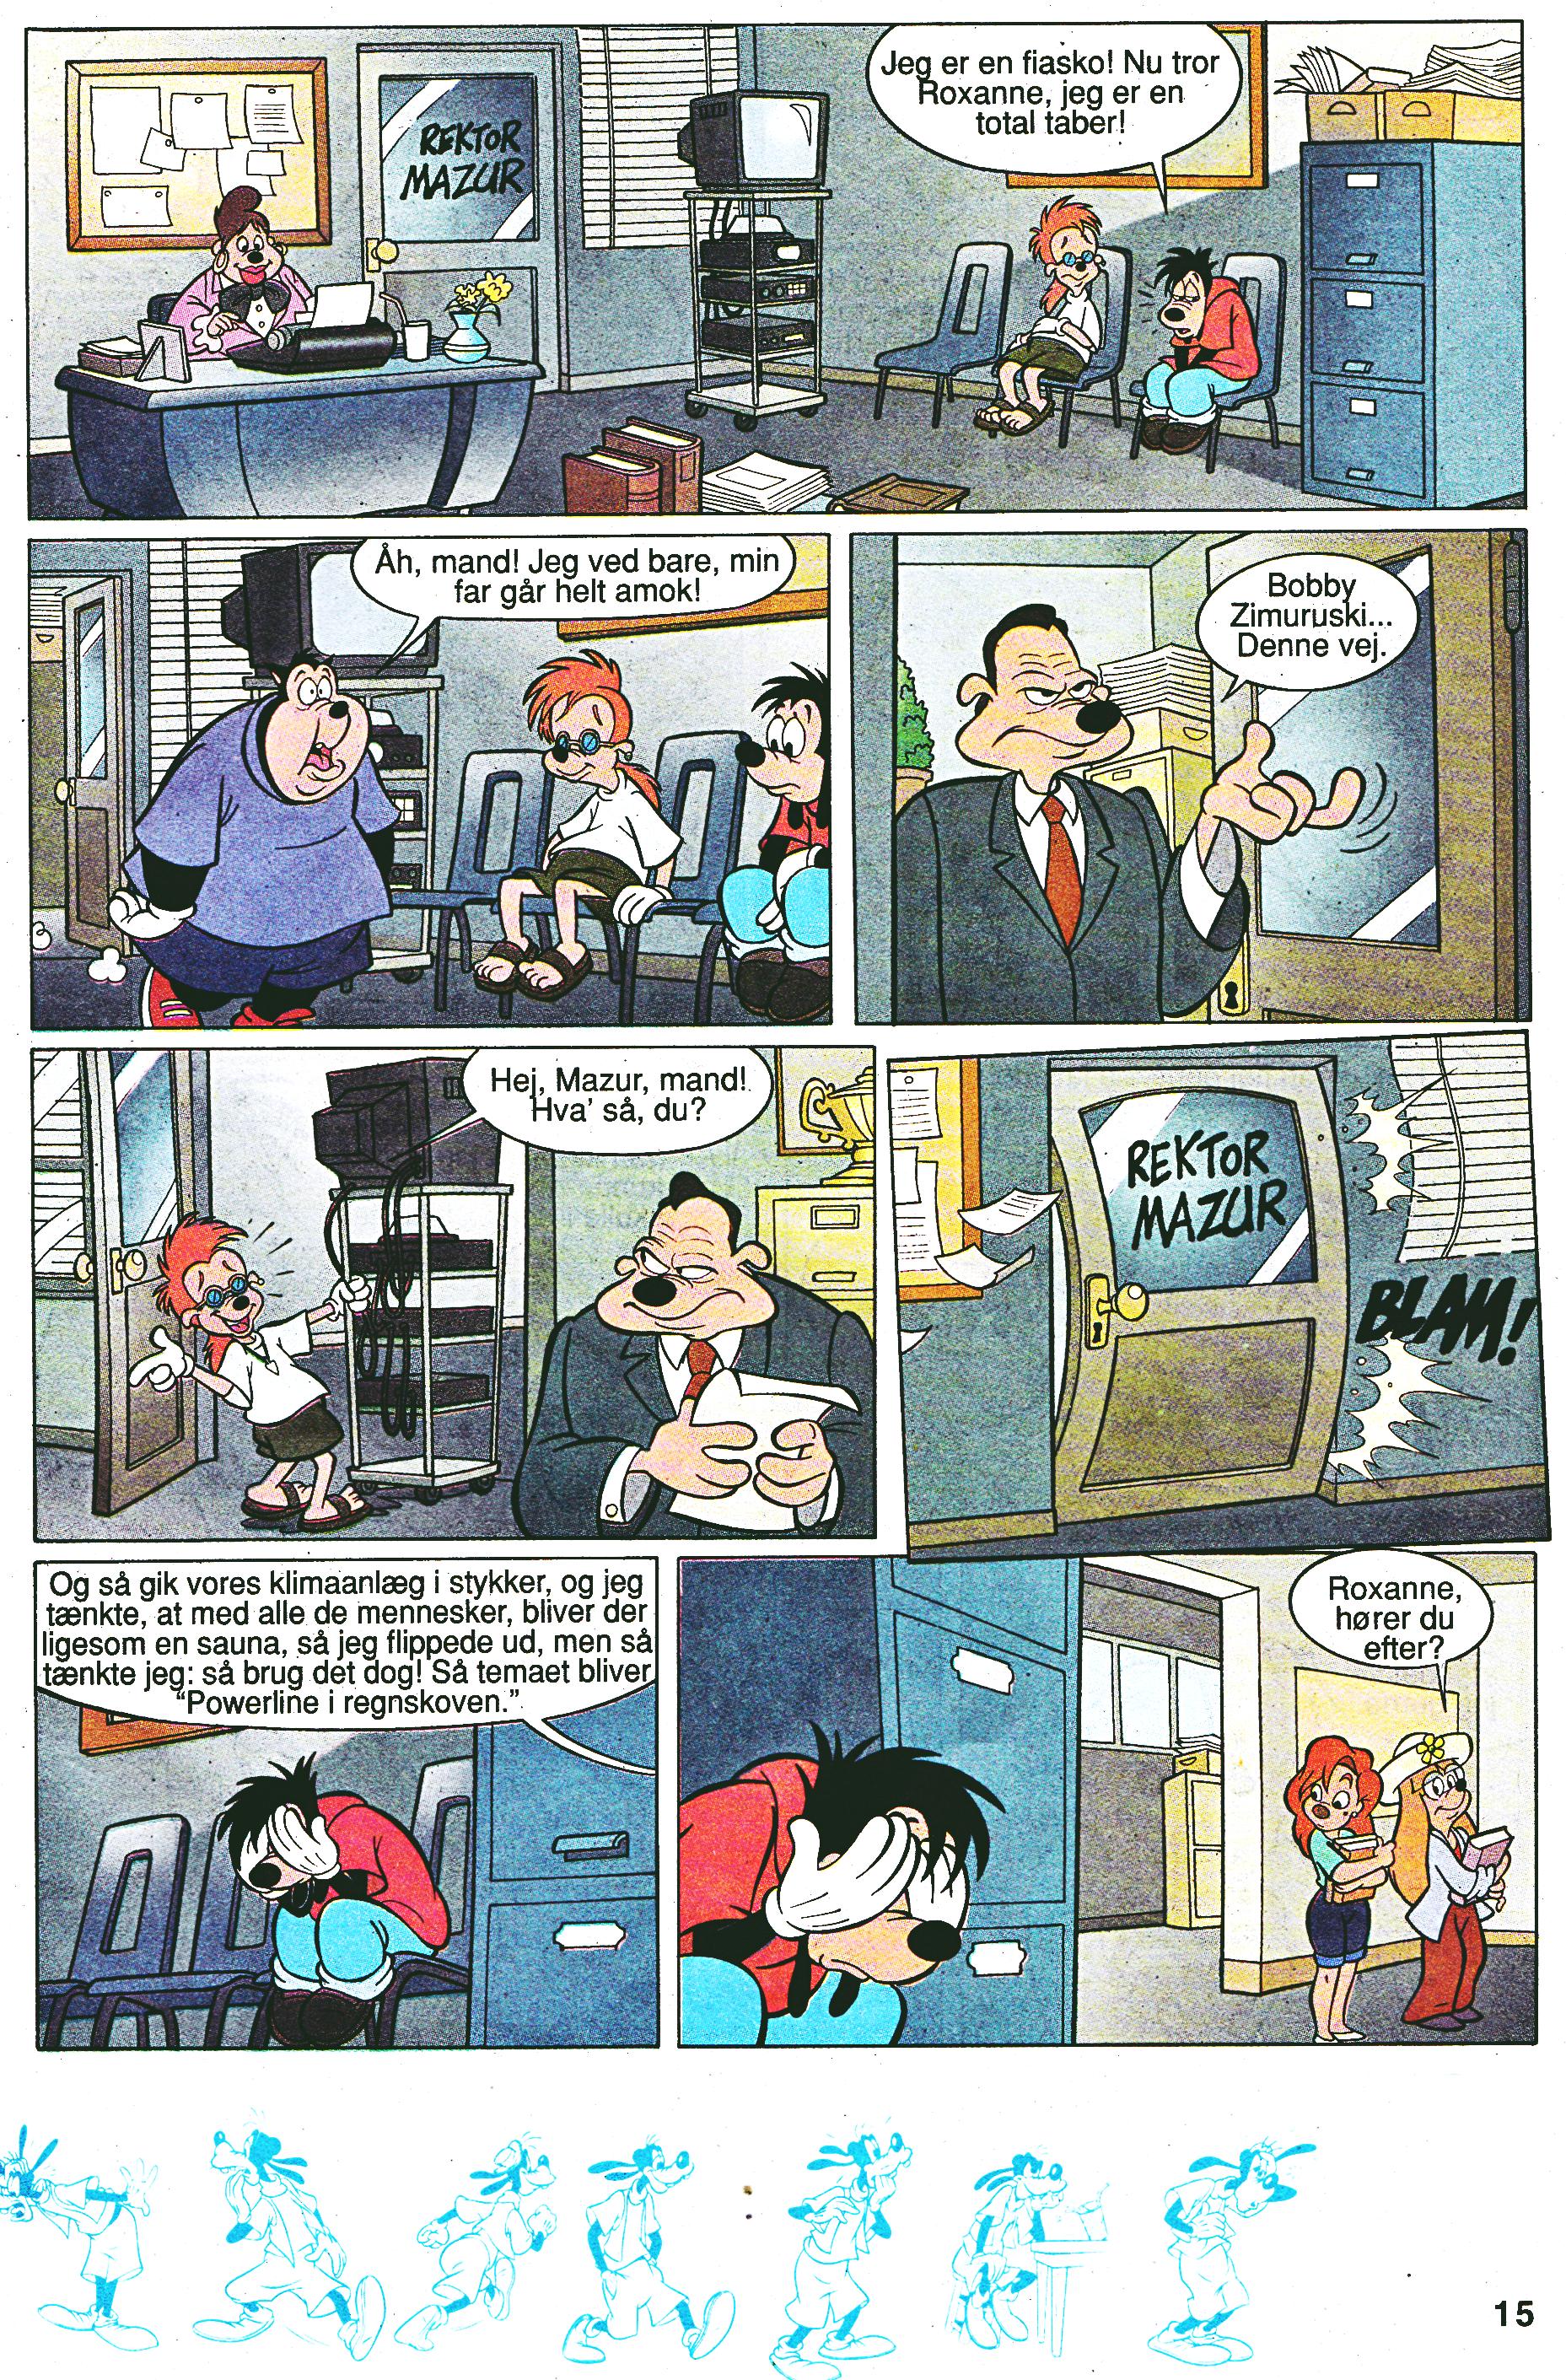 Walt Disney Movie Comics - A Goofy Movie (Danish Edition)